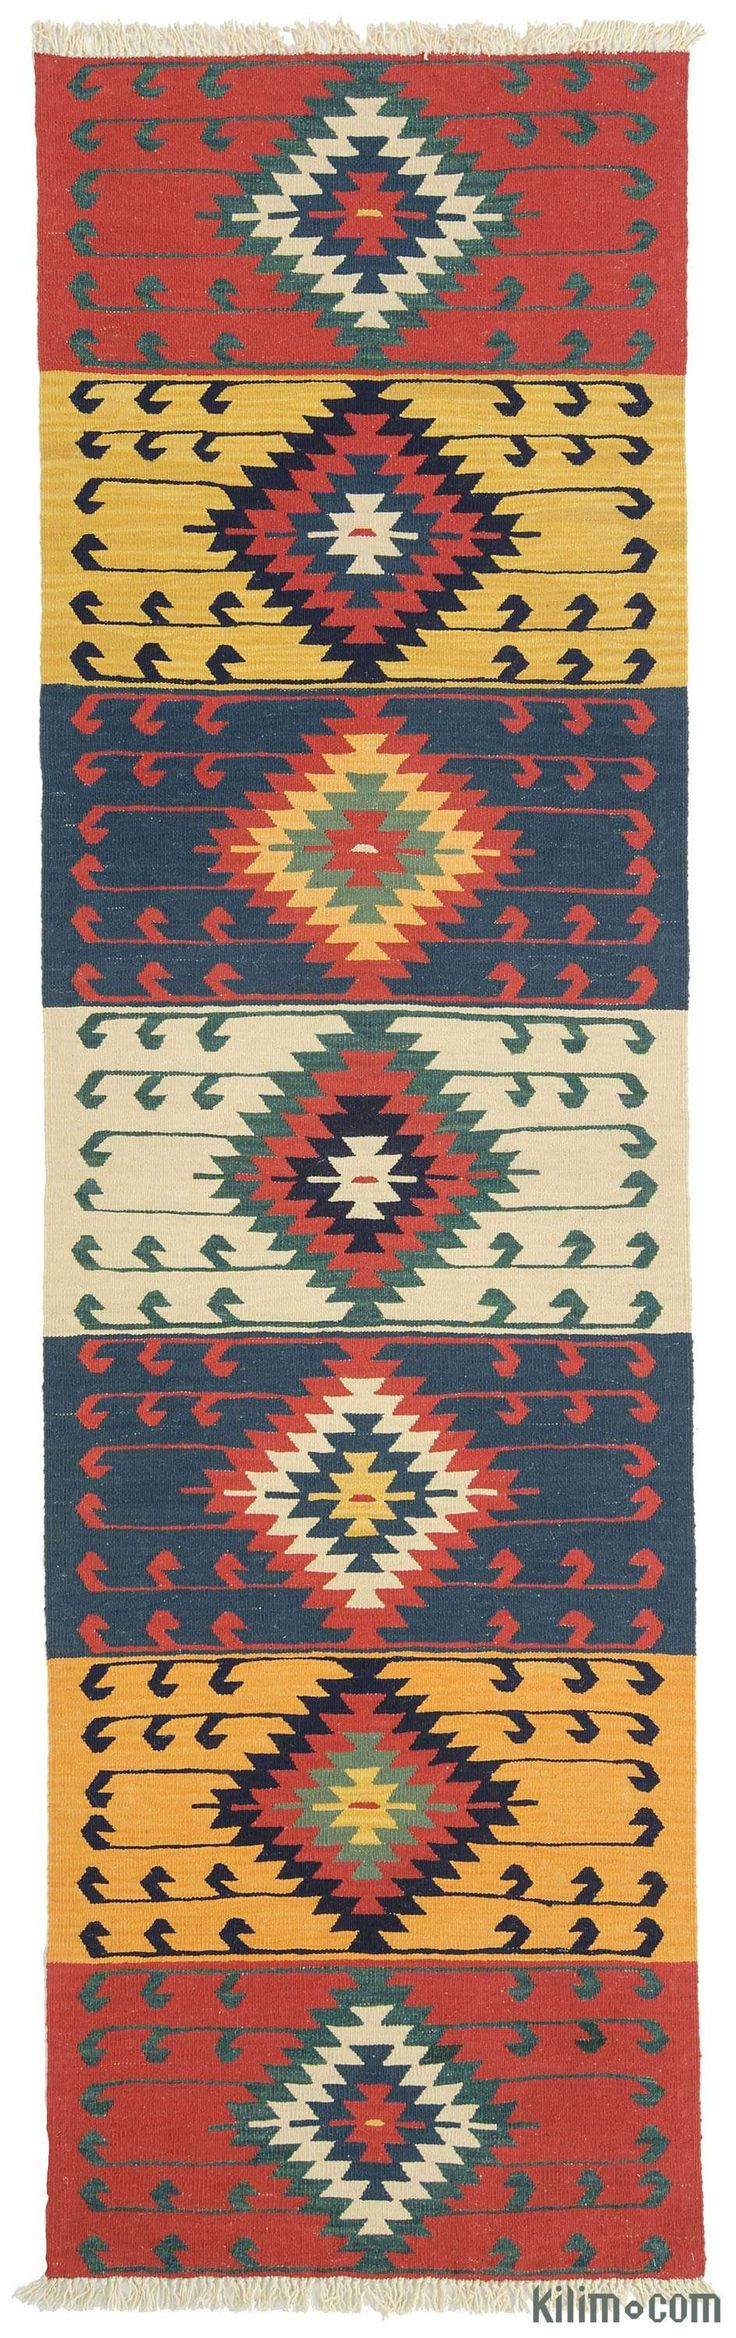 K0010796 New Turkish Kilim Runner Rug   Kilim Rugs, Overdyed Vintage Rugs, Hand-made Turkish Rugs, Patchwork Carpets by Kilim.com